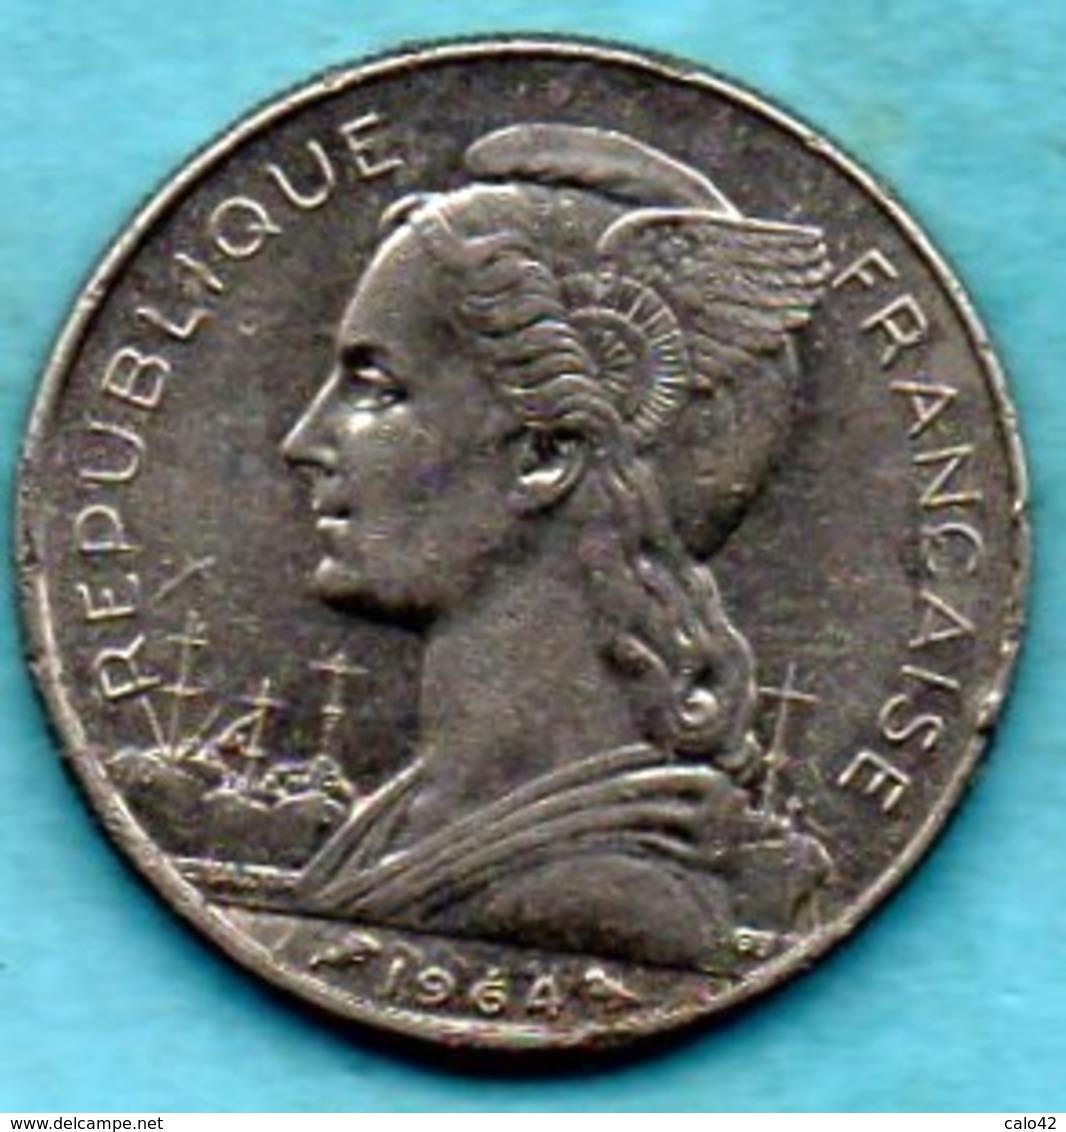 NO/  REUNION French Colonie  50 Francs 1964  KM#12 - Réunion